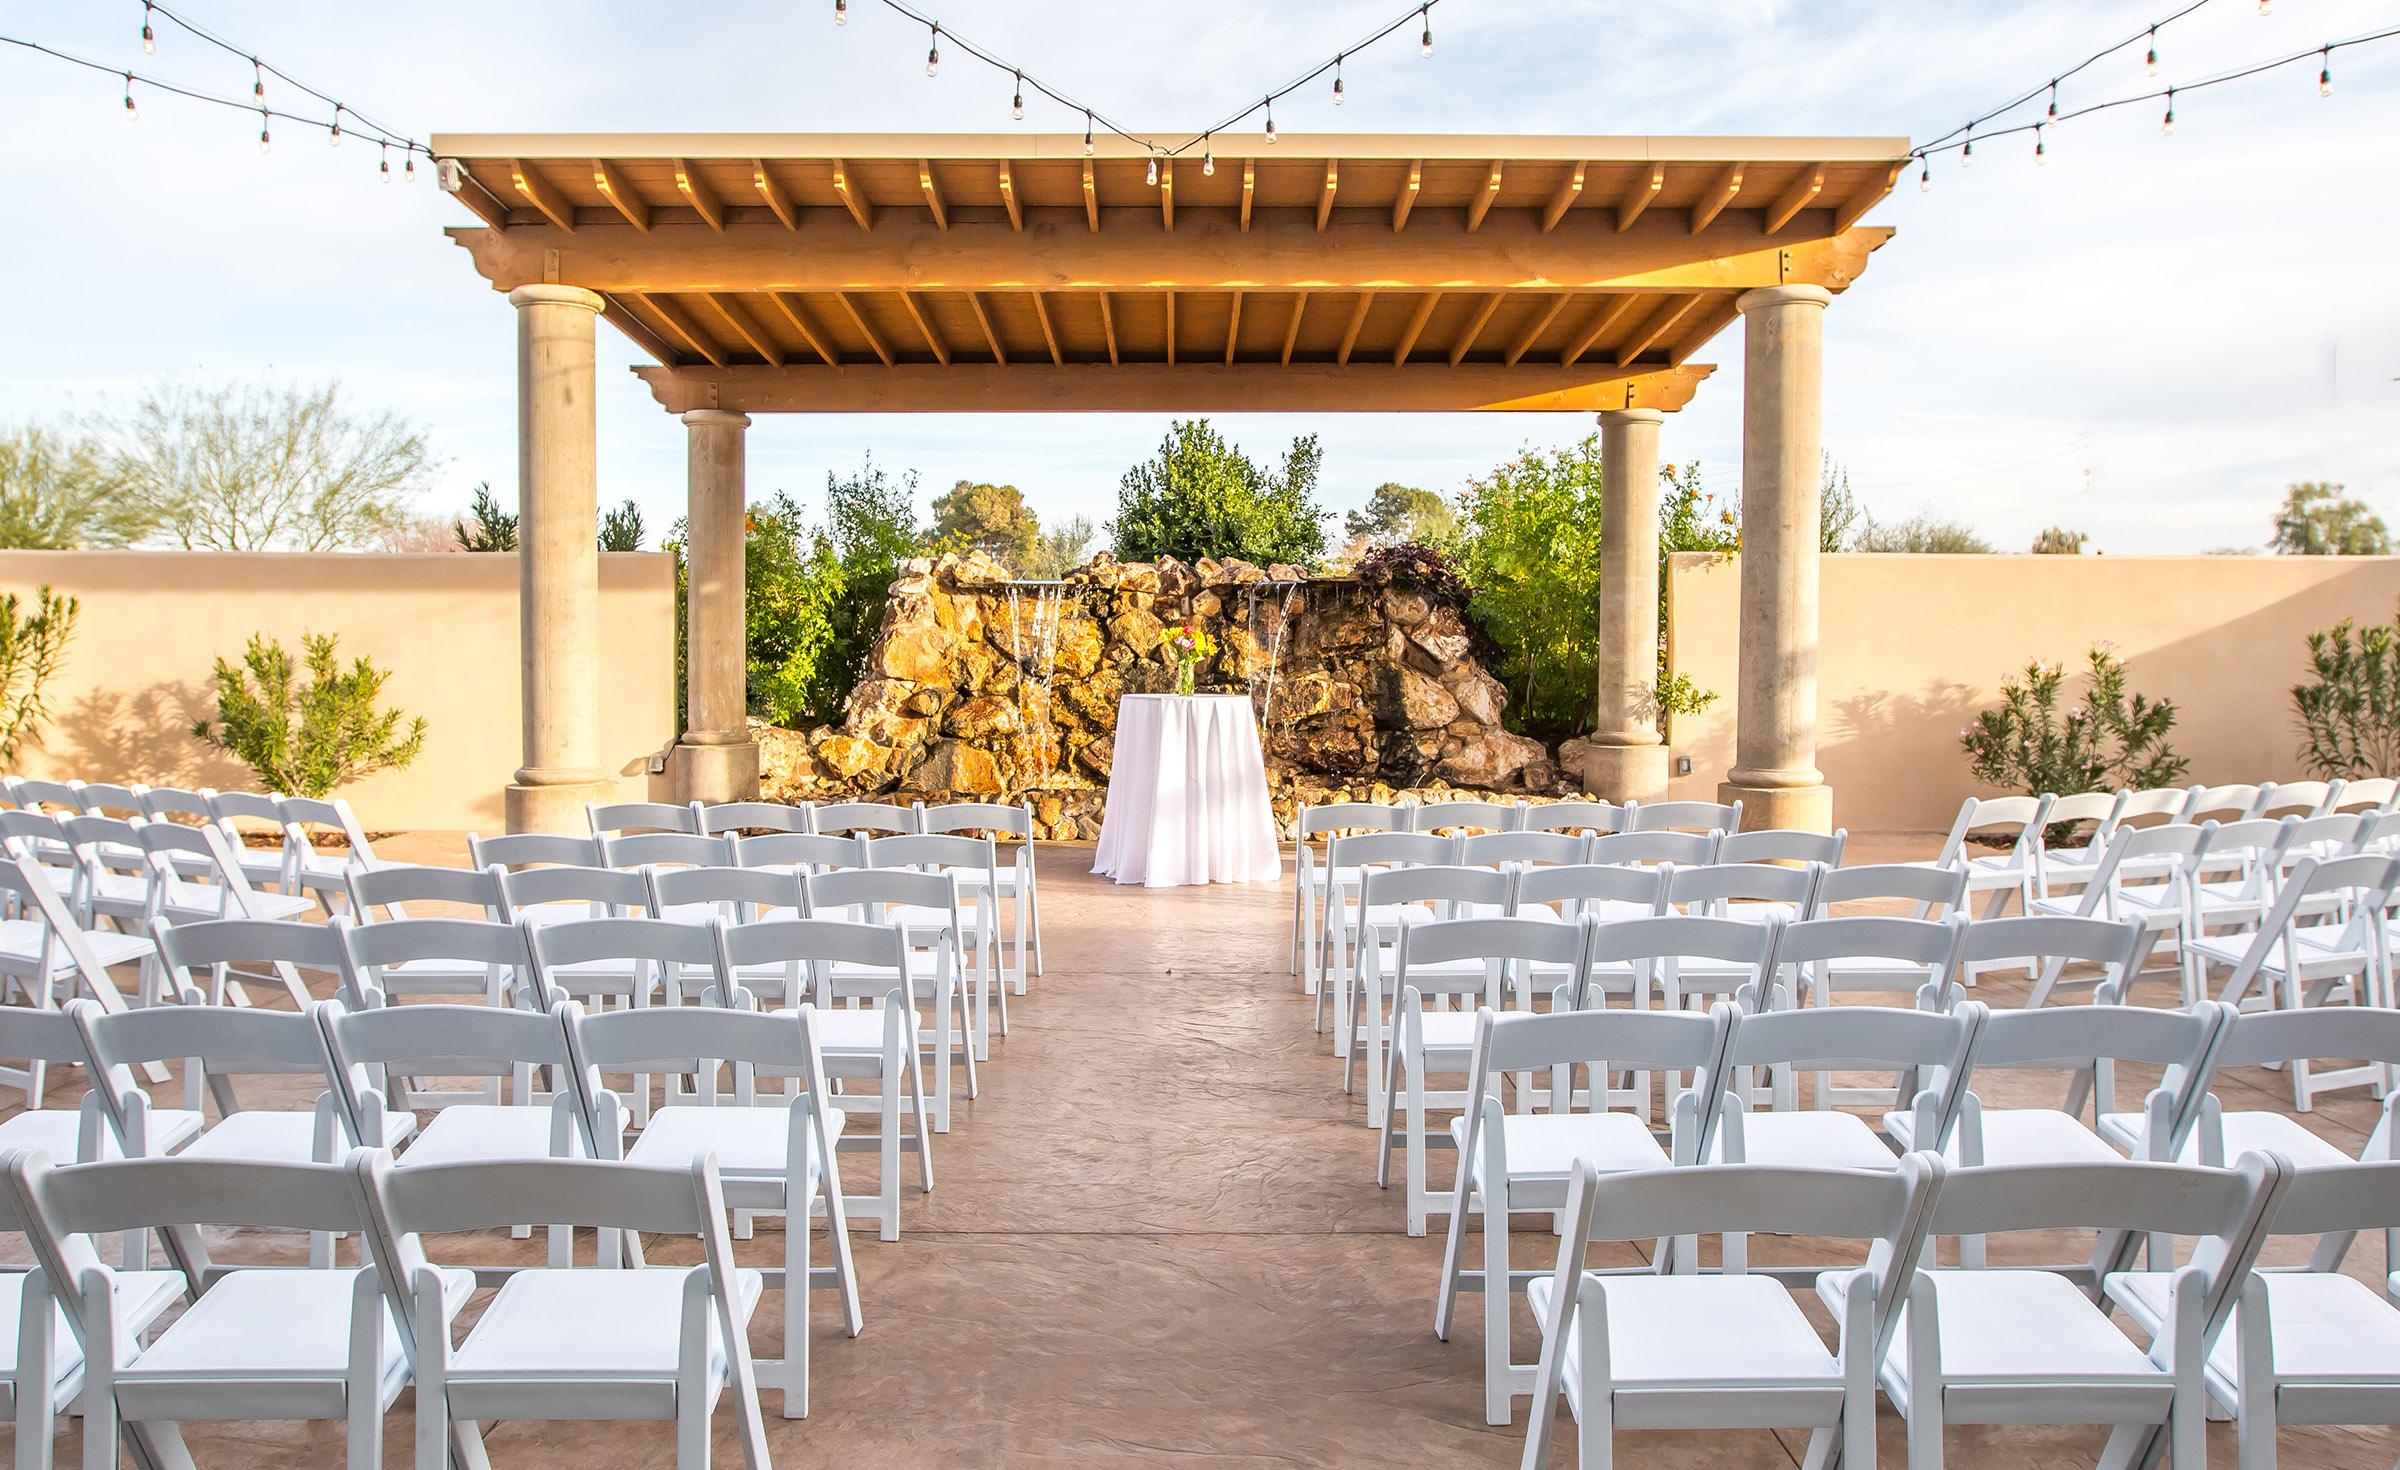 East Valley wedding ceremony site - Colby Falls - Gilbert, Arizona - Maricopa County - Wedgewood Weddings